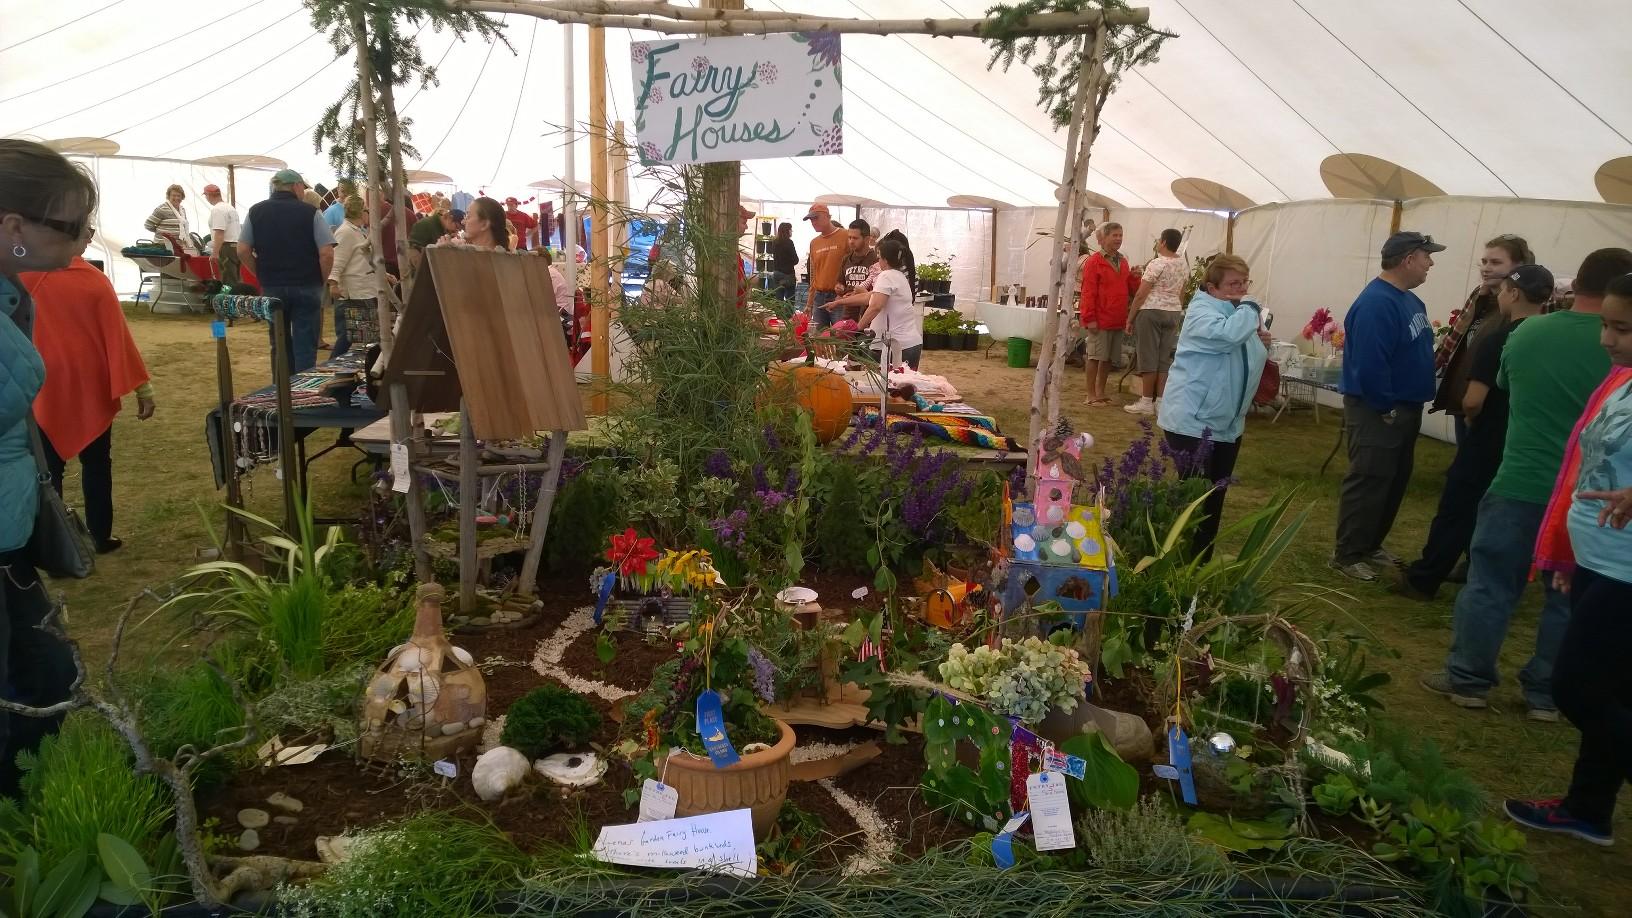 Nantucket Island Fair